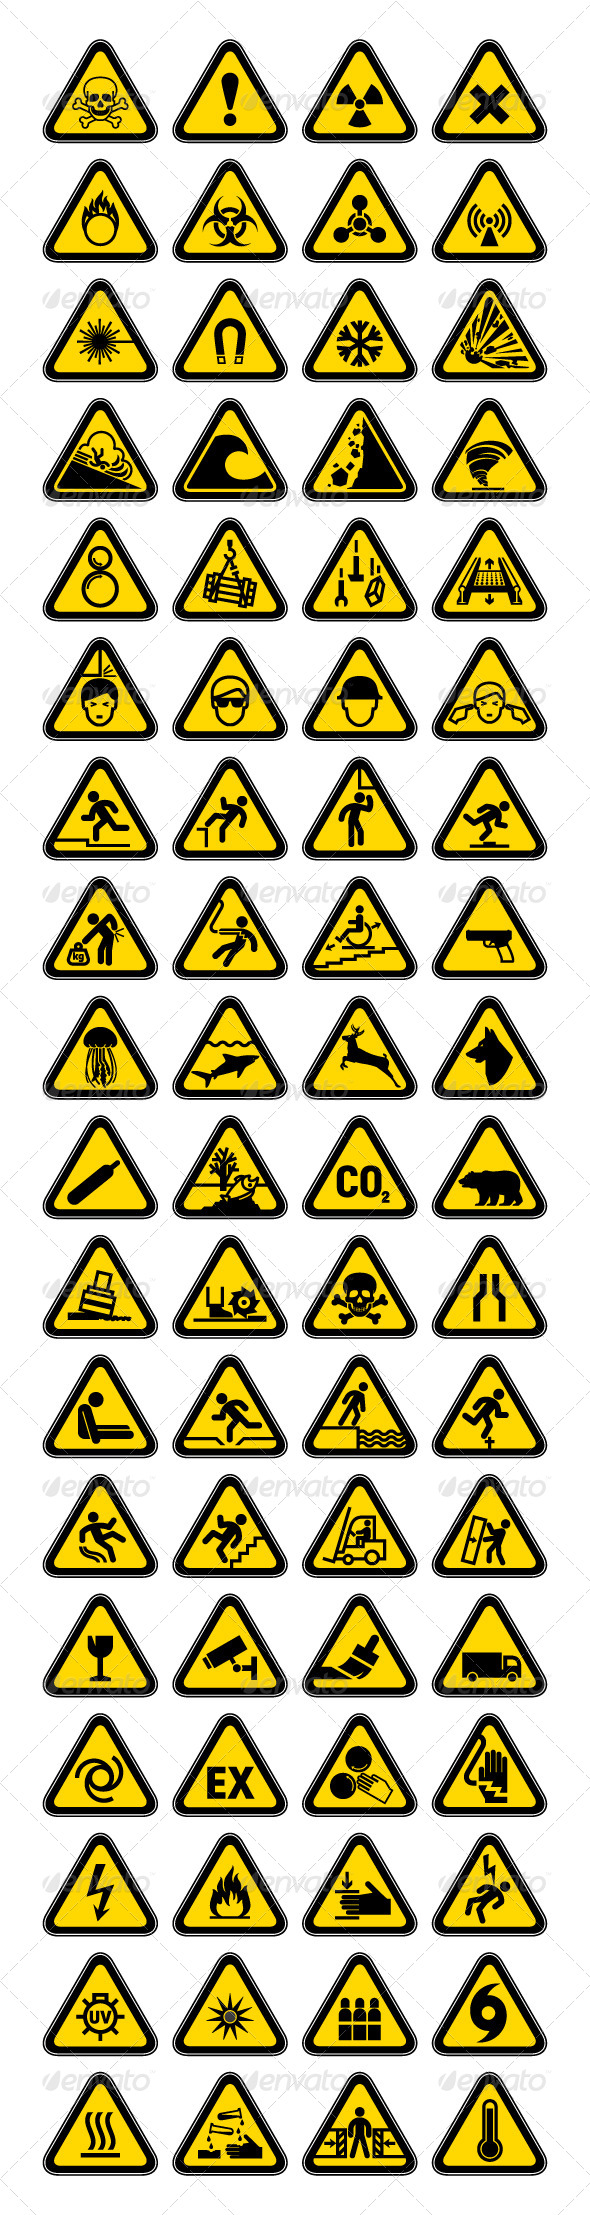 72 Hazard Warning Symbols, Labels Triangular - Vectors